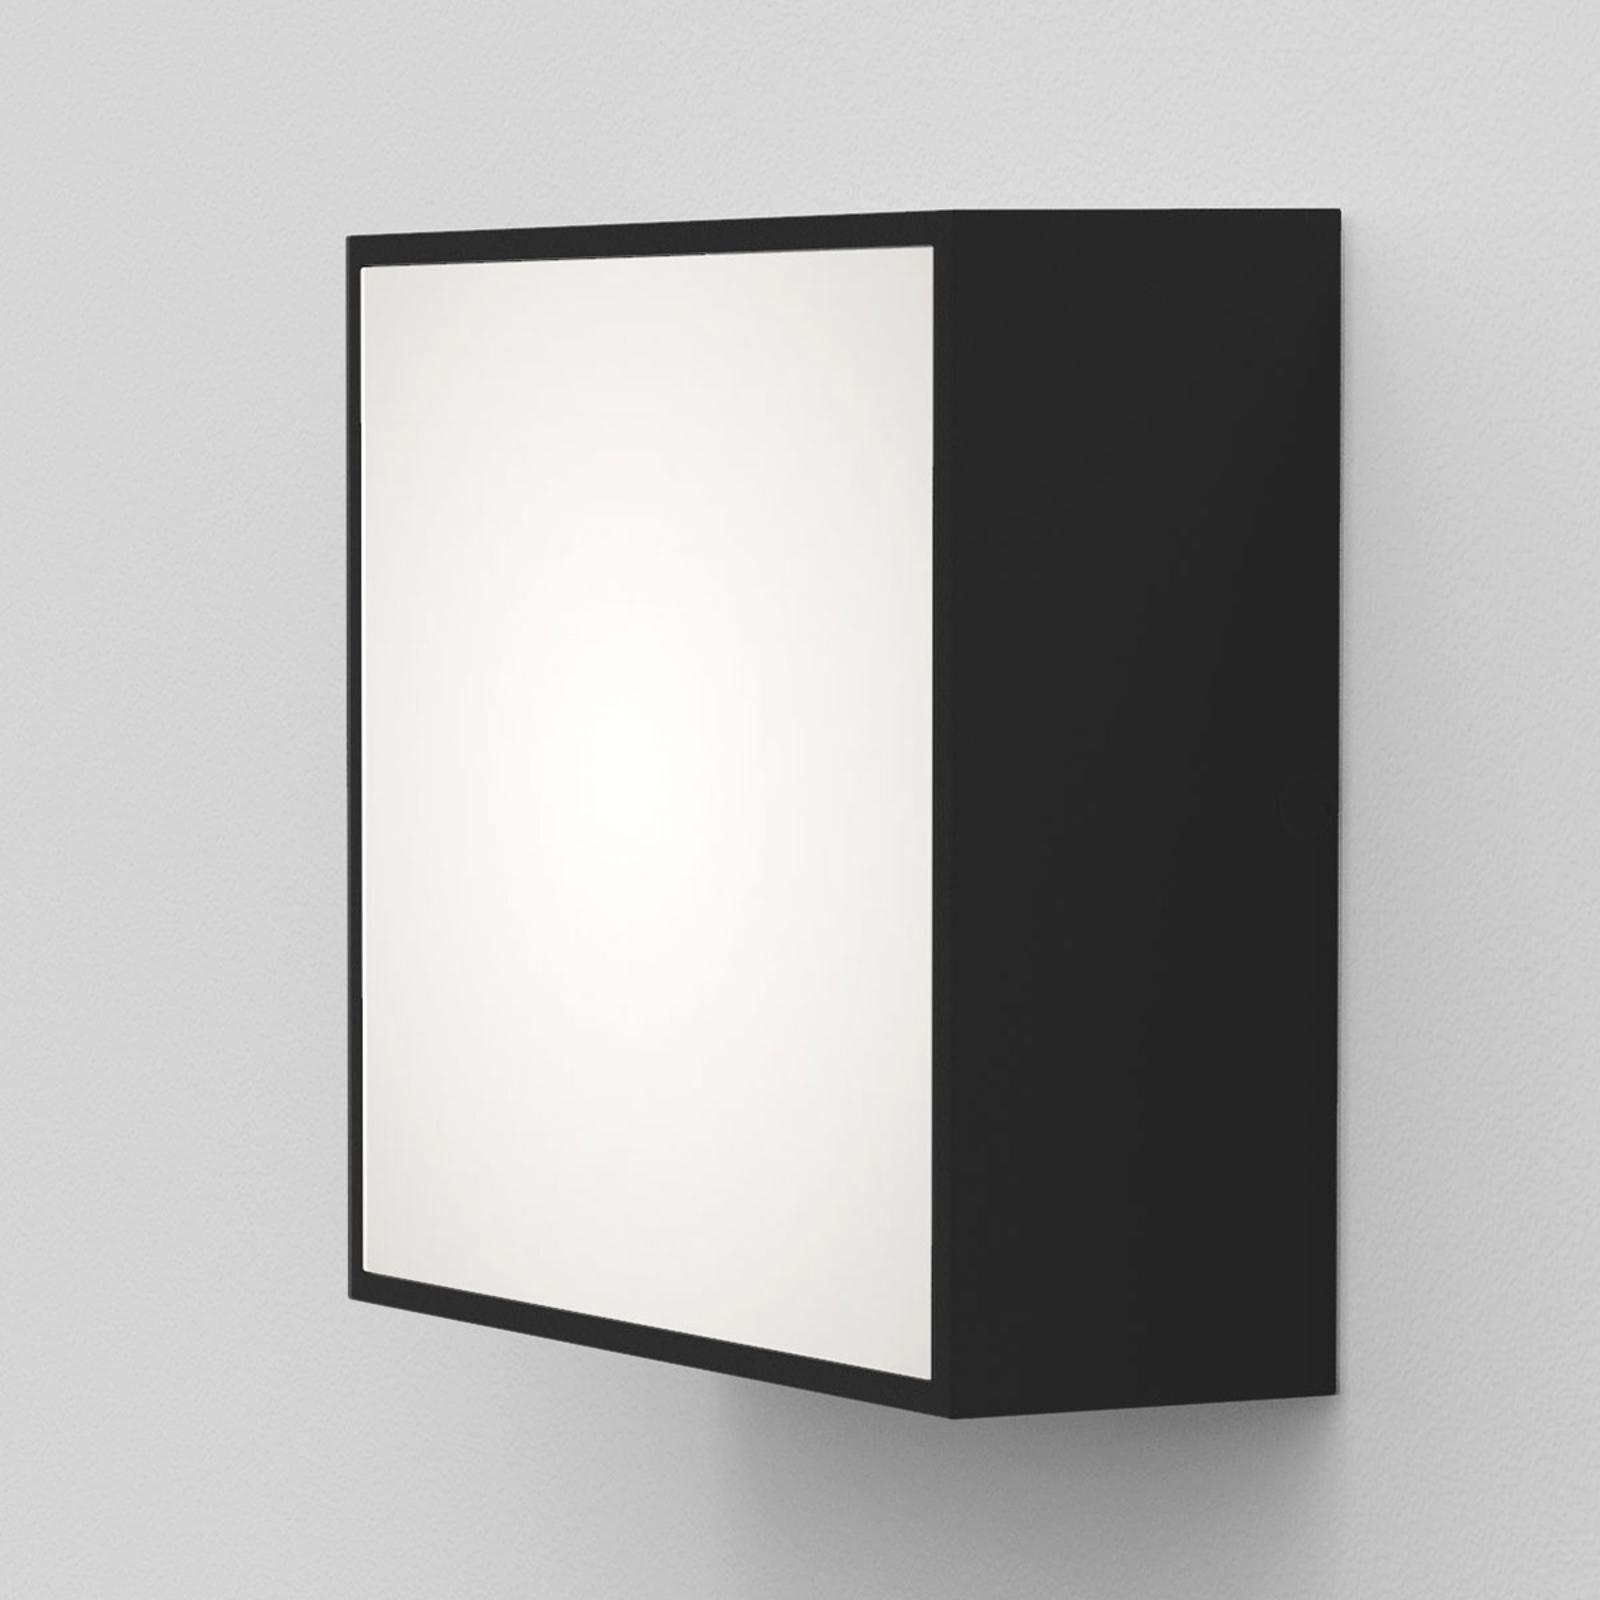 Astro Kea Square 140 LED-Wandleuchte schwarz